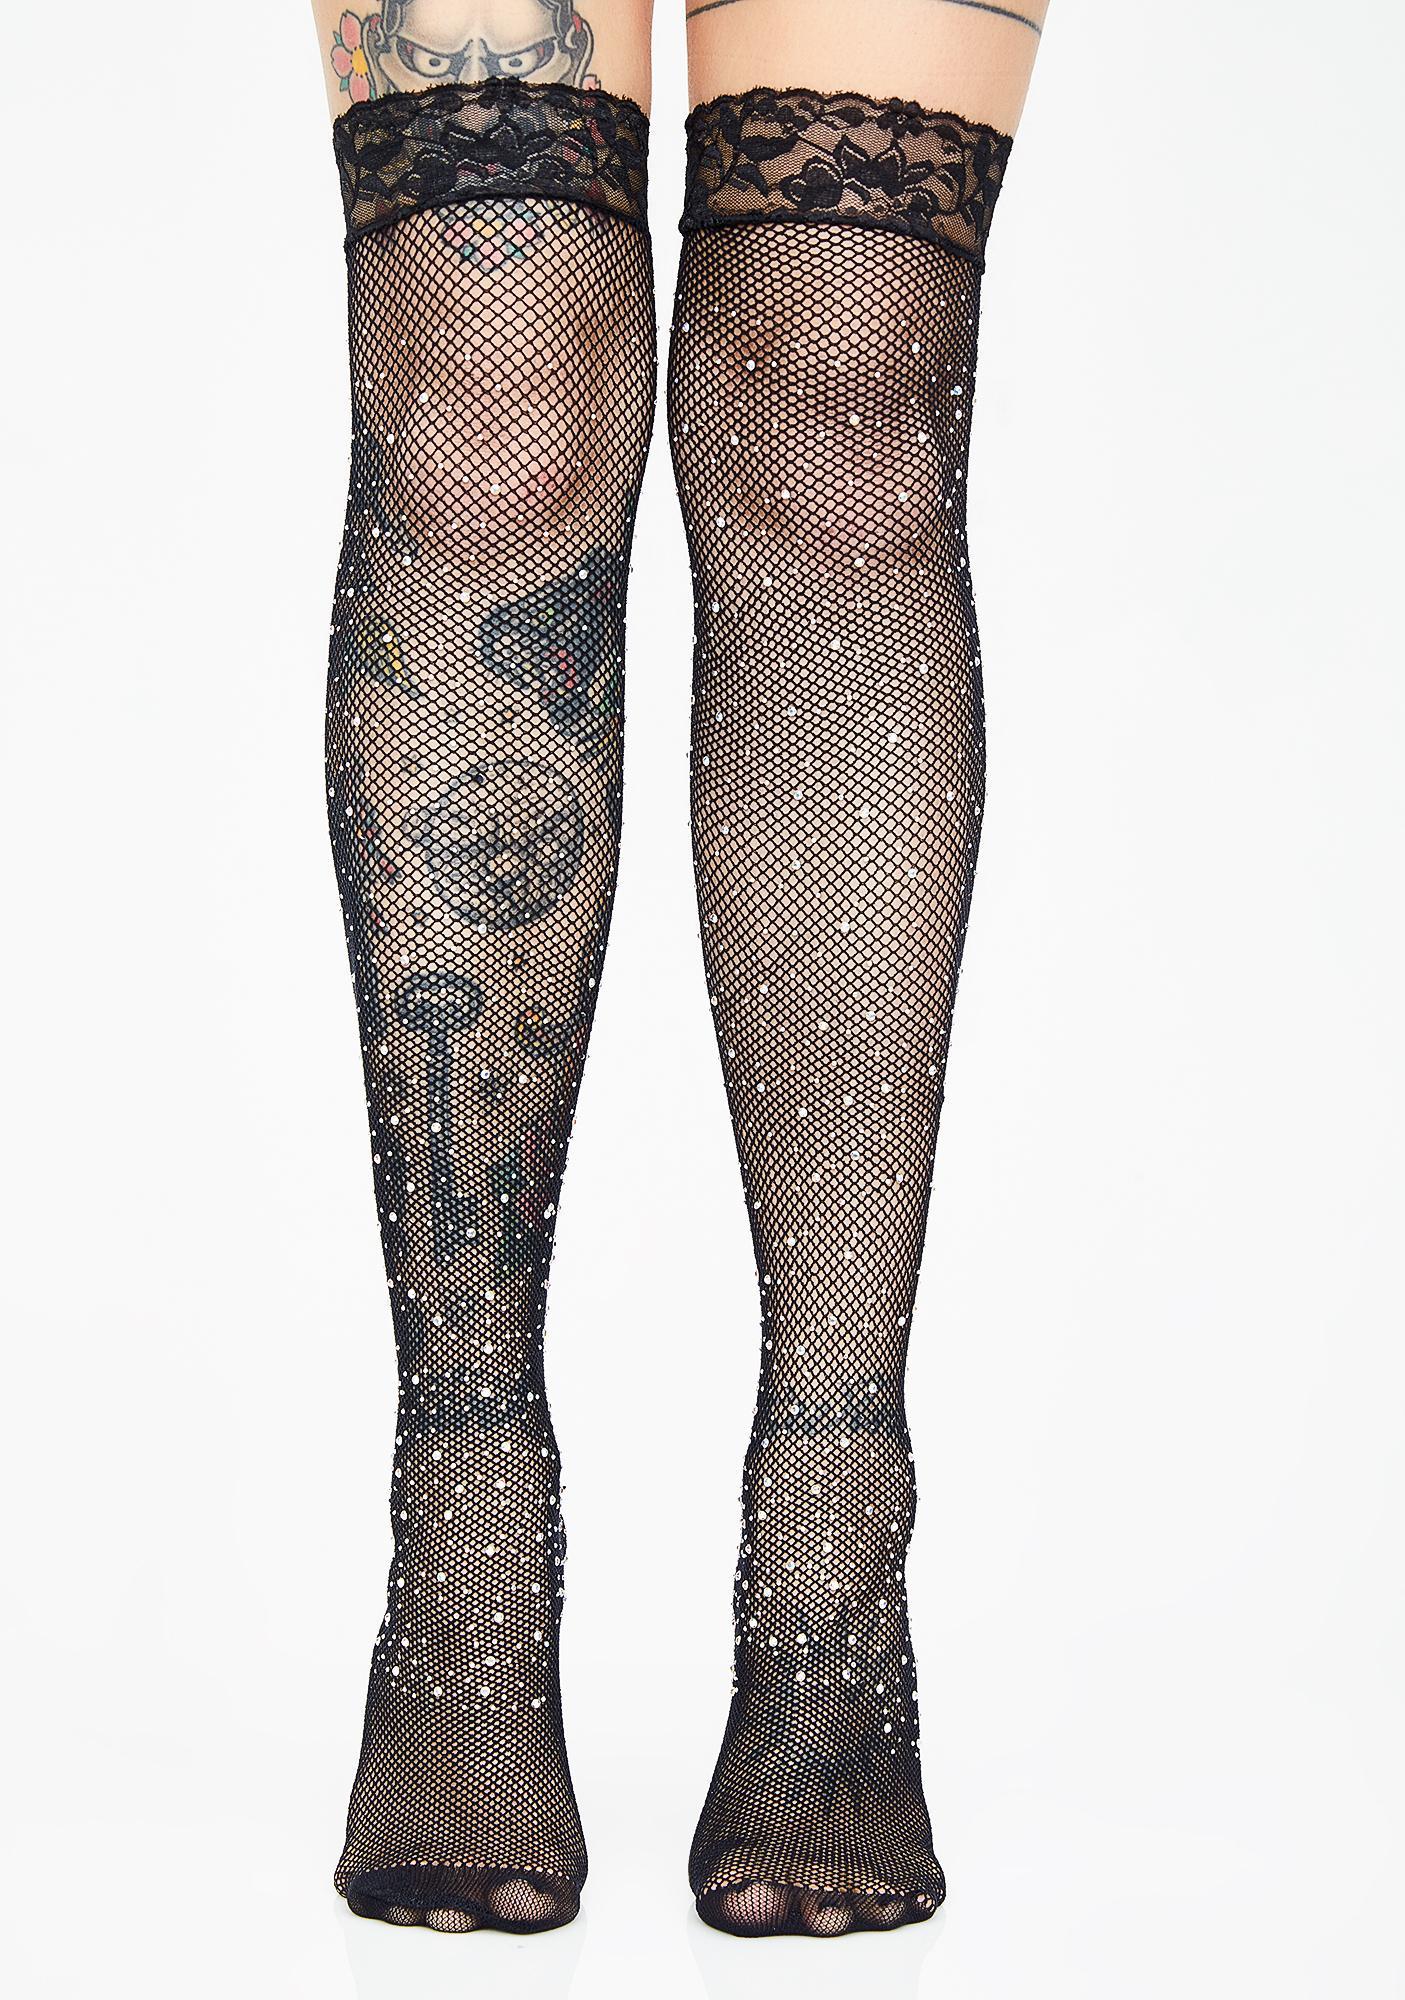 5076f50598dee Rhinestone Thigh High Fishnet Stockings | Dolls Kill